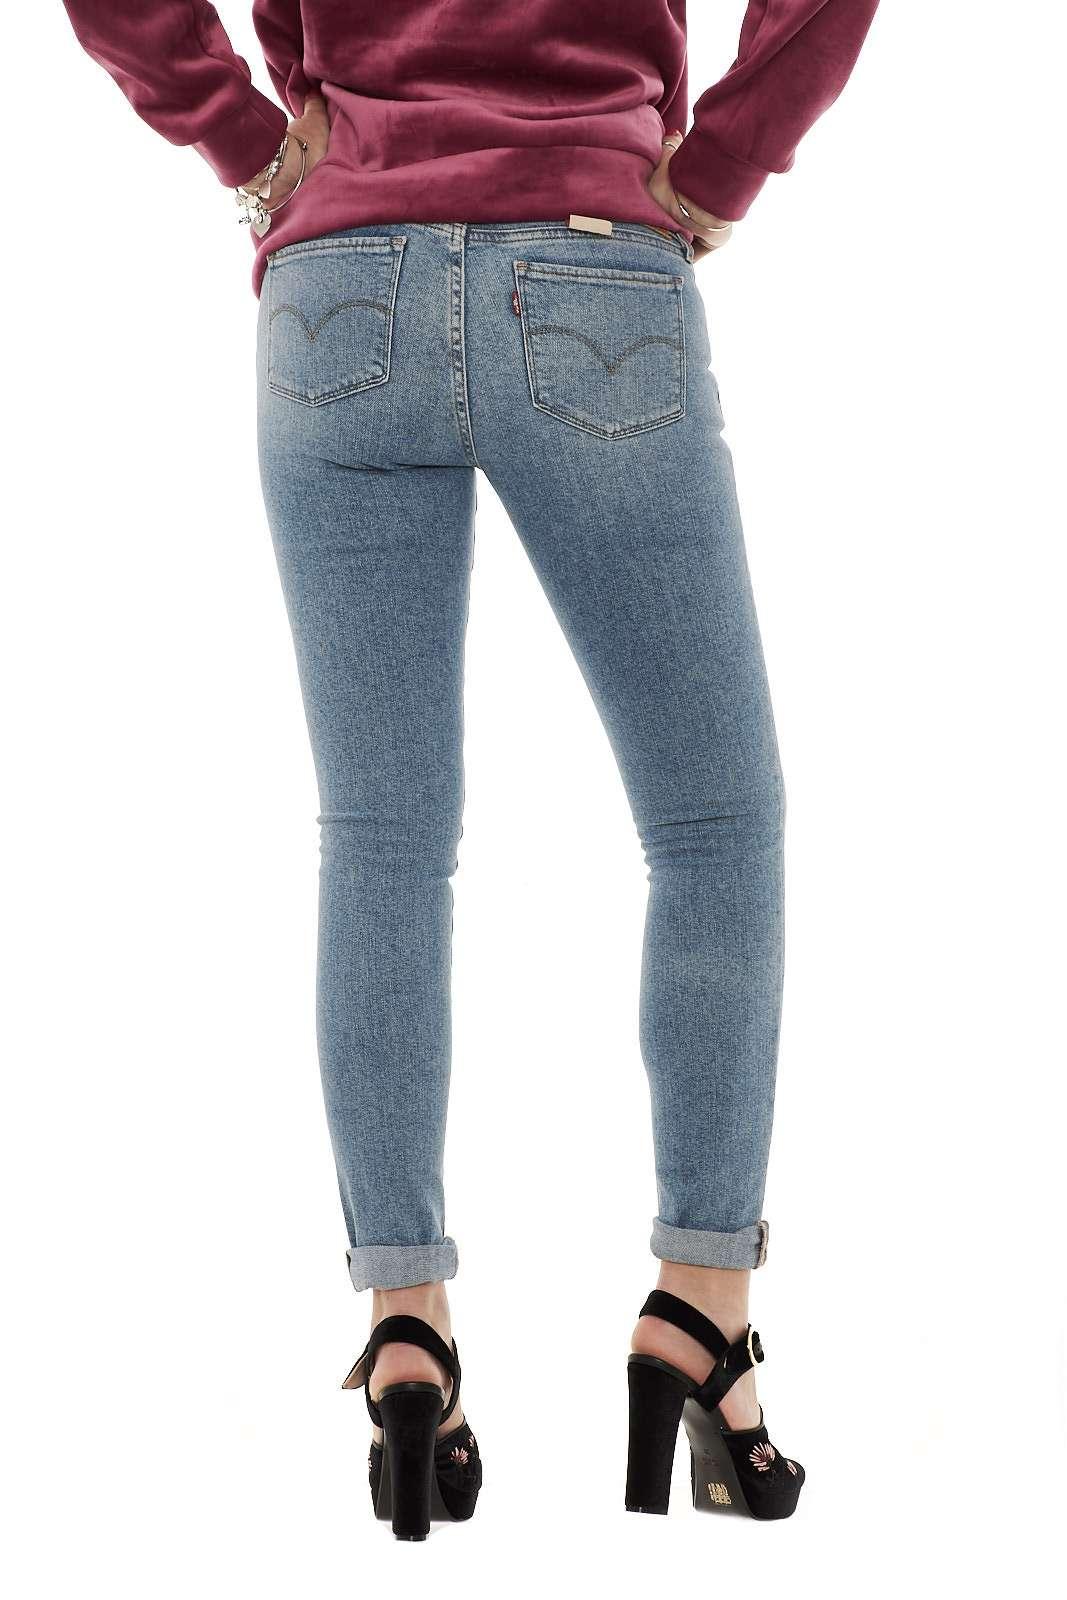 https://www.parmax.com/media/tmp/catalog/product/a/i/ai-outlet_parmax-jeans-donna-levis-18810100-c.jpg